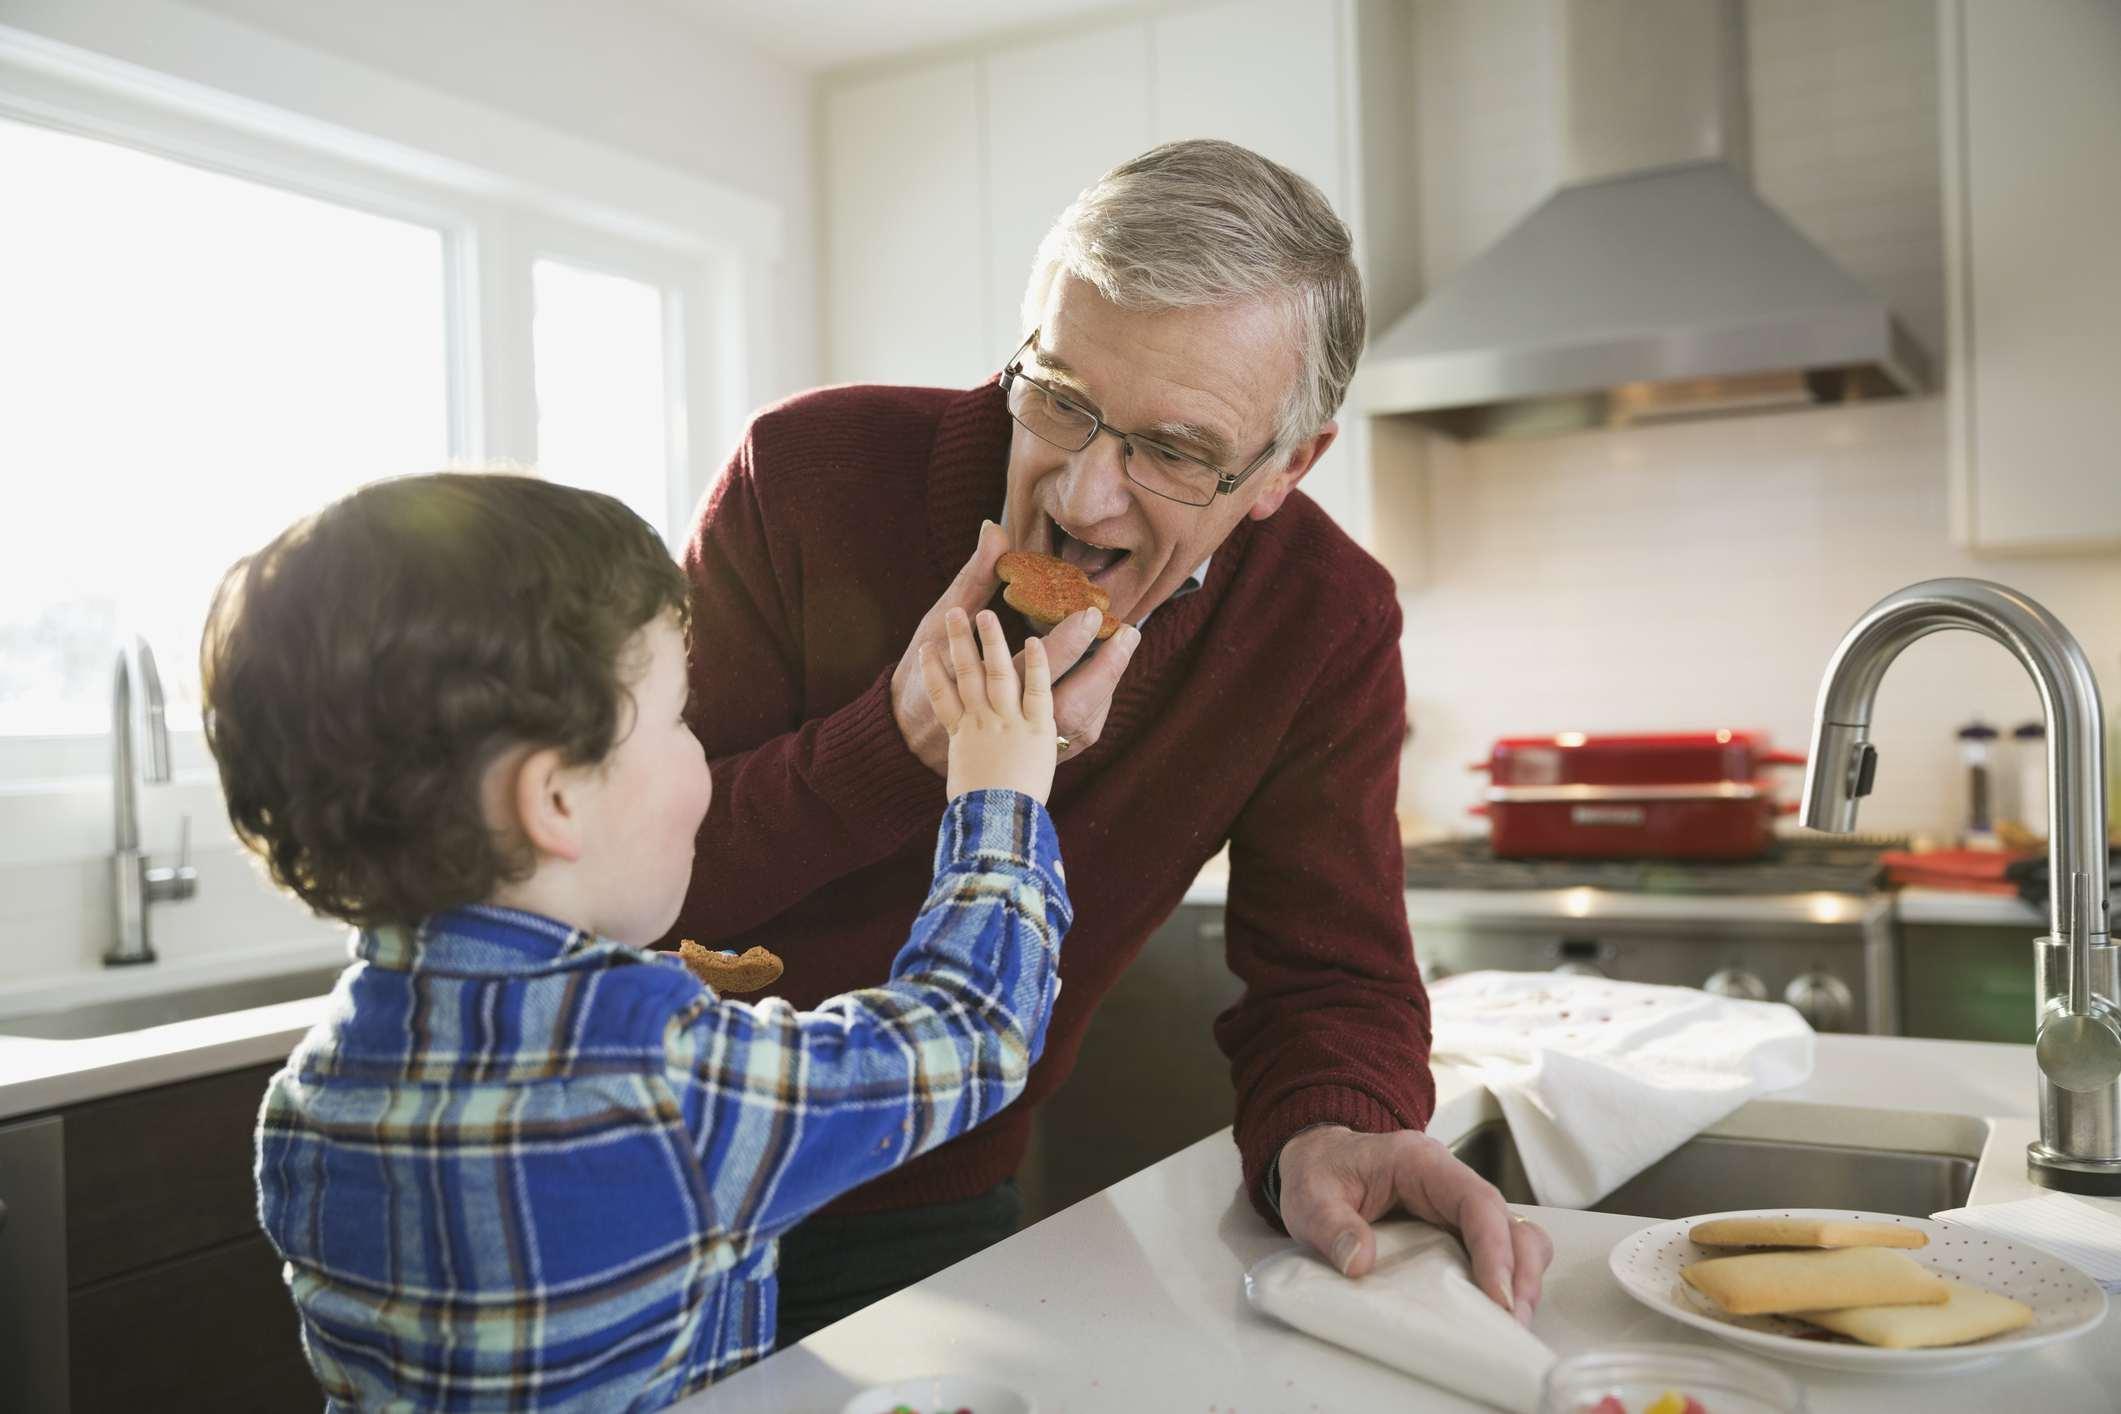 Boy feeding Christmas cookie to grandfather